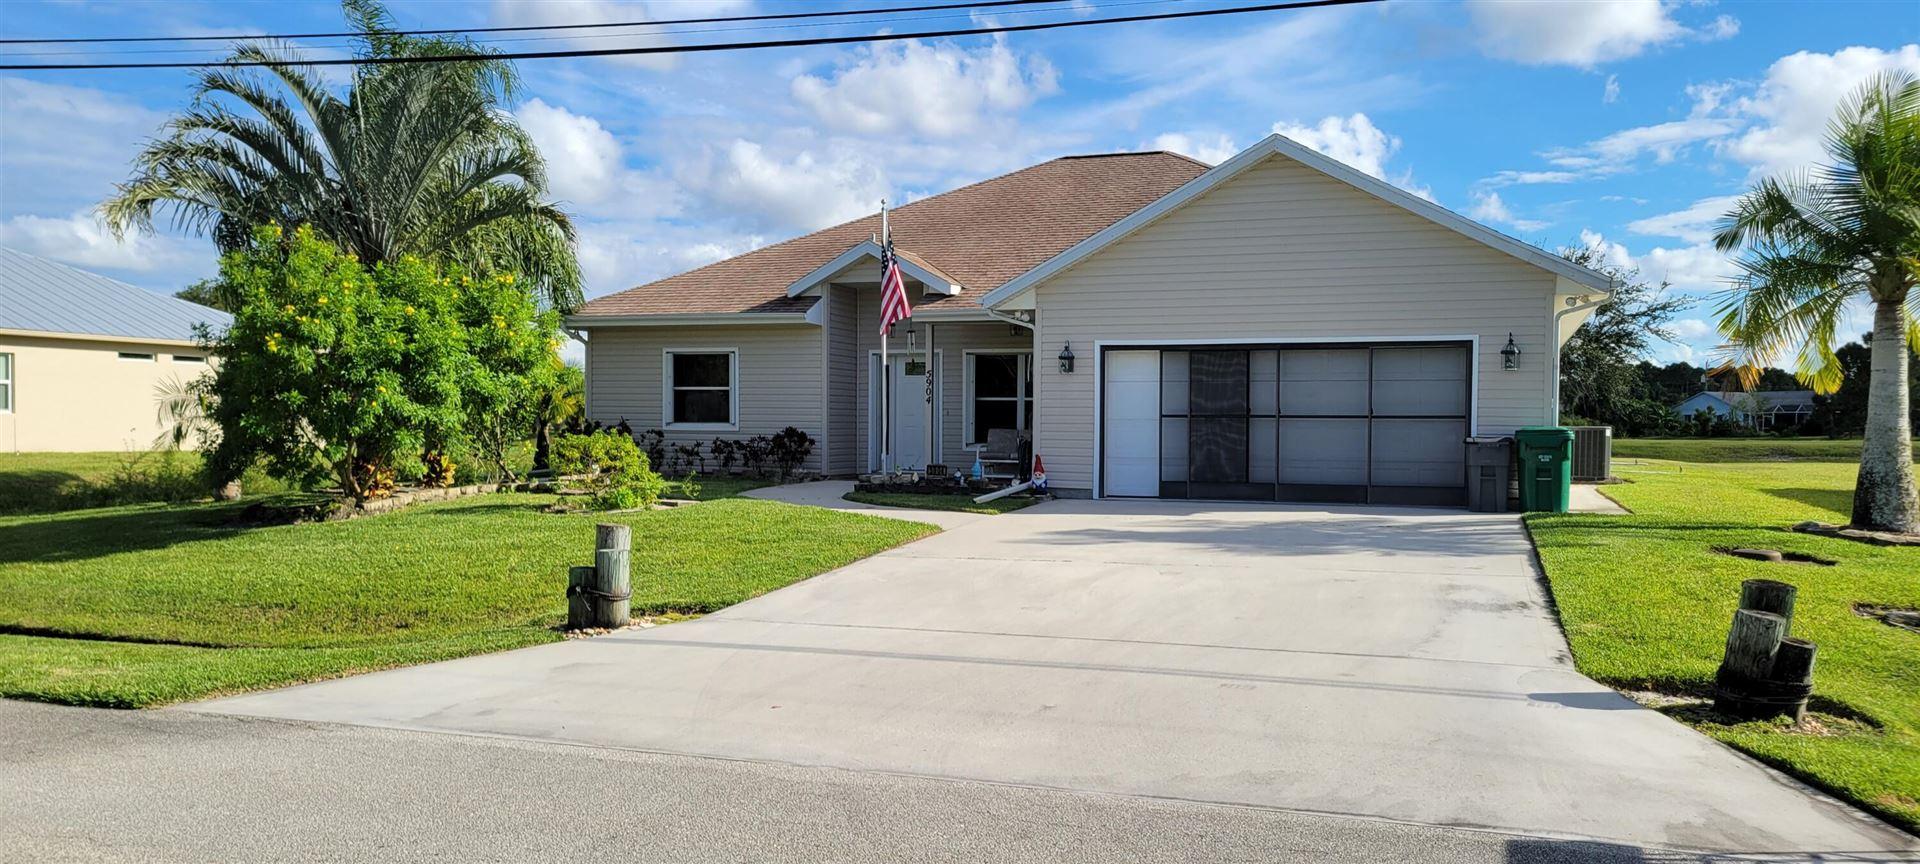 5904 NW Favian Avenue, Port Saint Lucie, FL 34986 - MLS#: RX-10748853